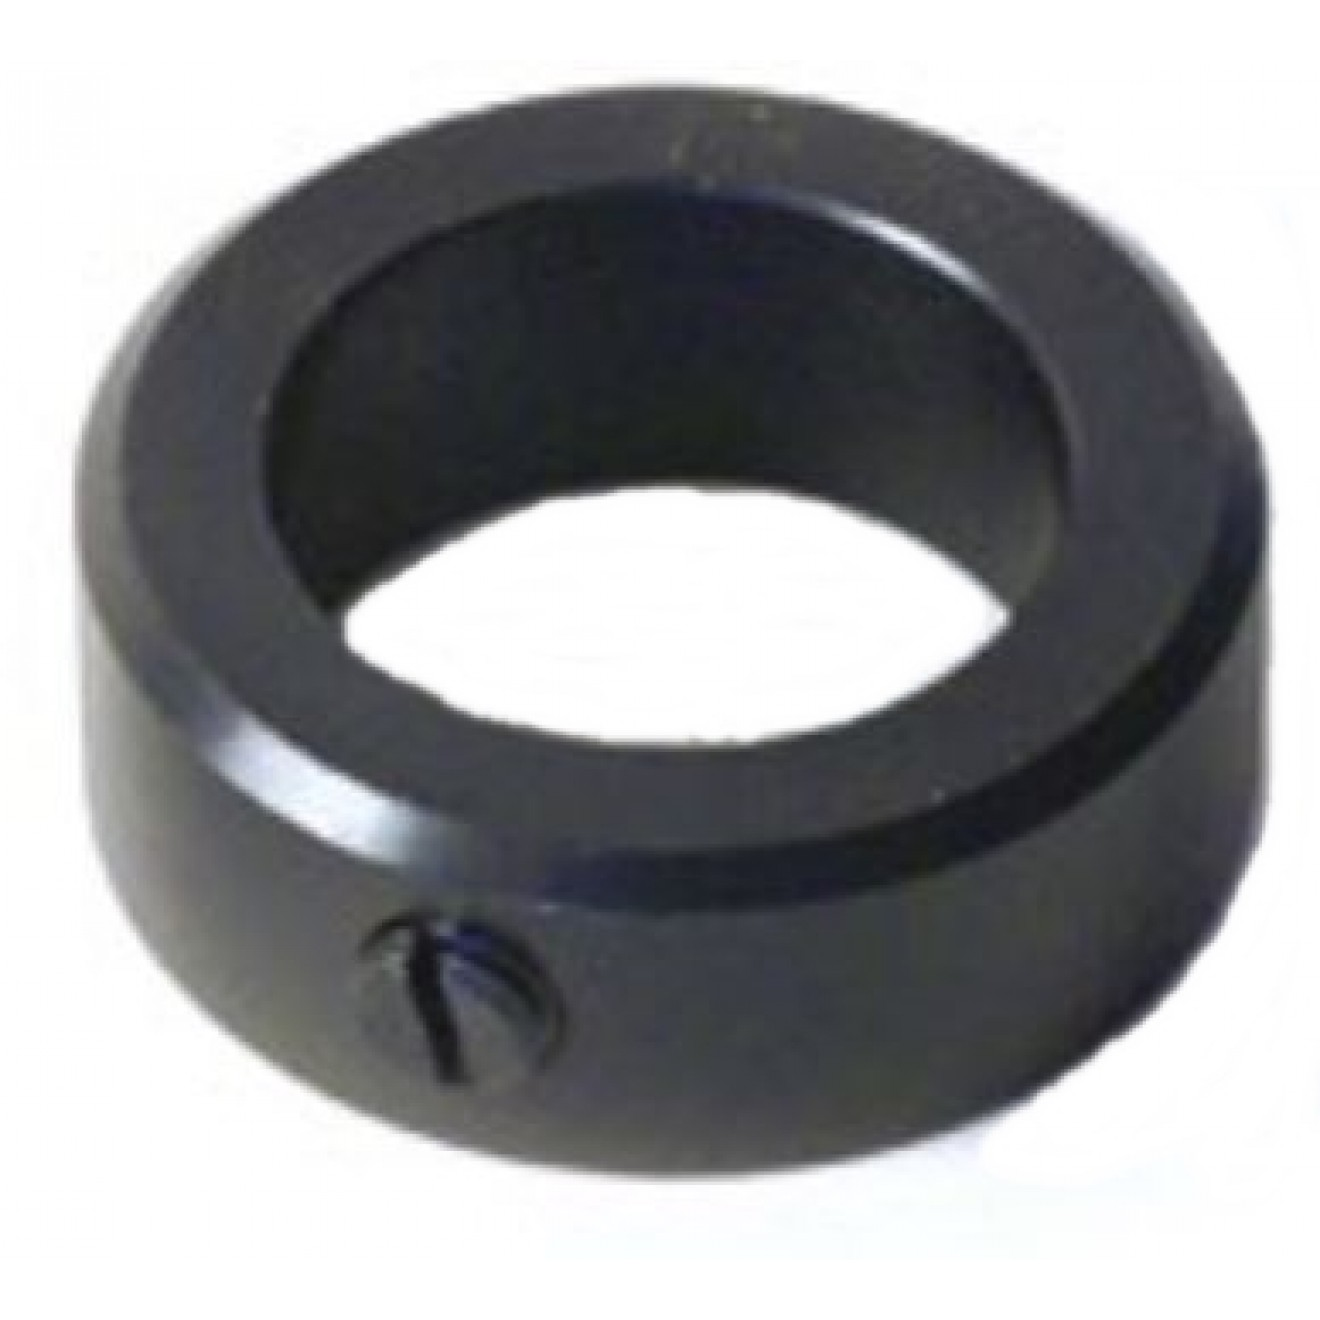 stellring din 705 aus stahl c45 schwarz br niert f r 22mm welle ve 4st ck ebay. Black Bedroom Furniture Sets. Home Design Ideas